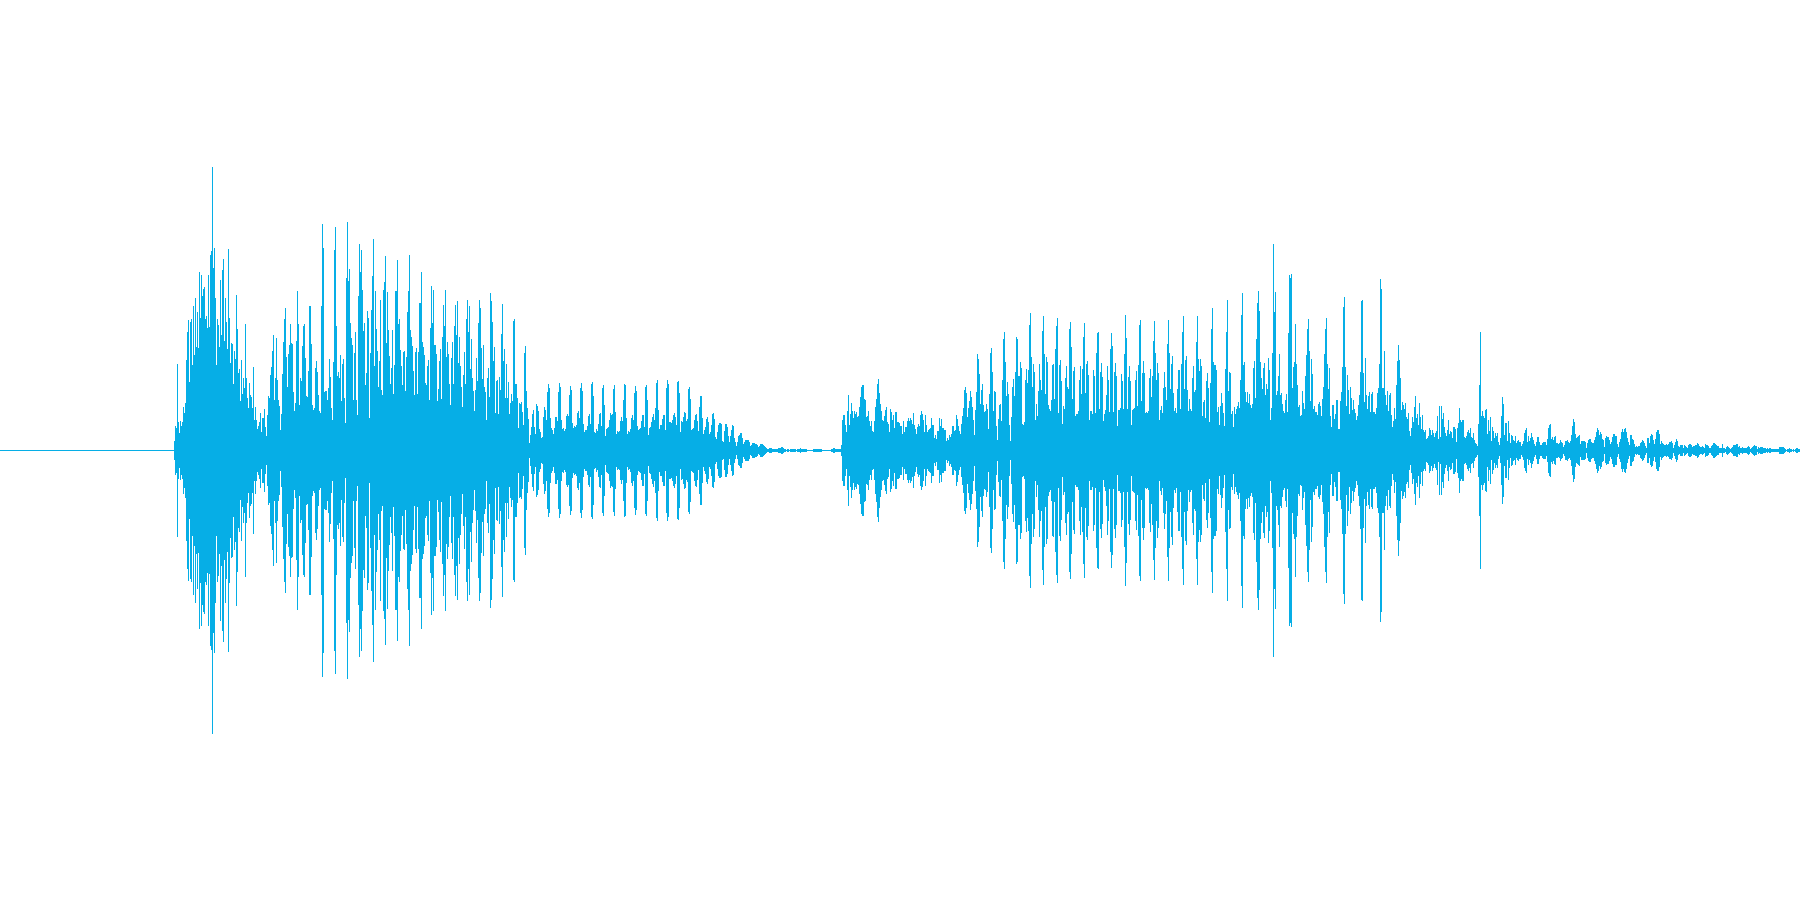 「10 PM」英語発音の再生済みの波形